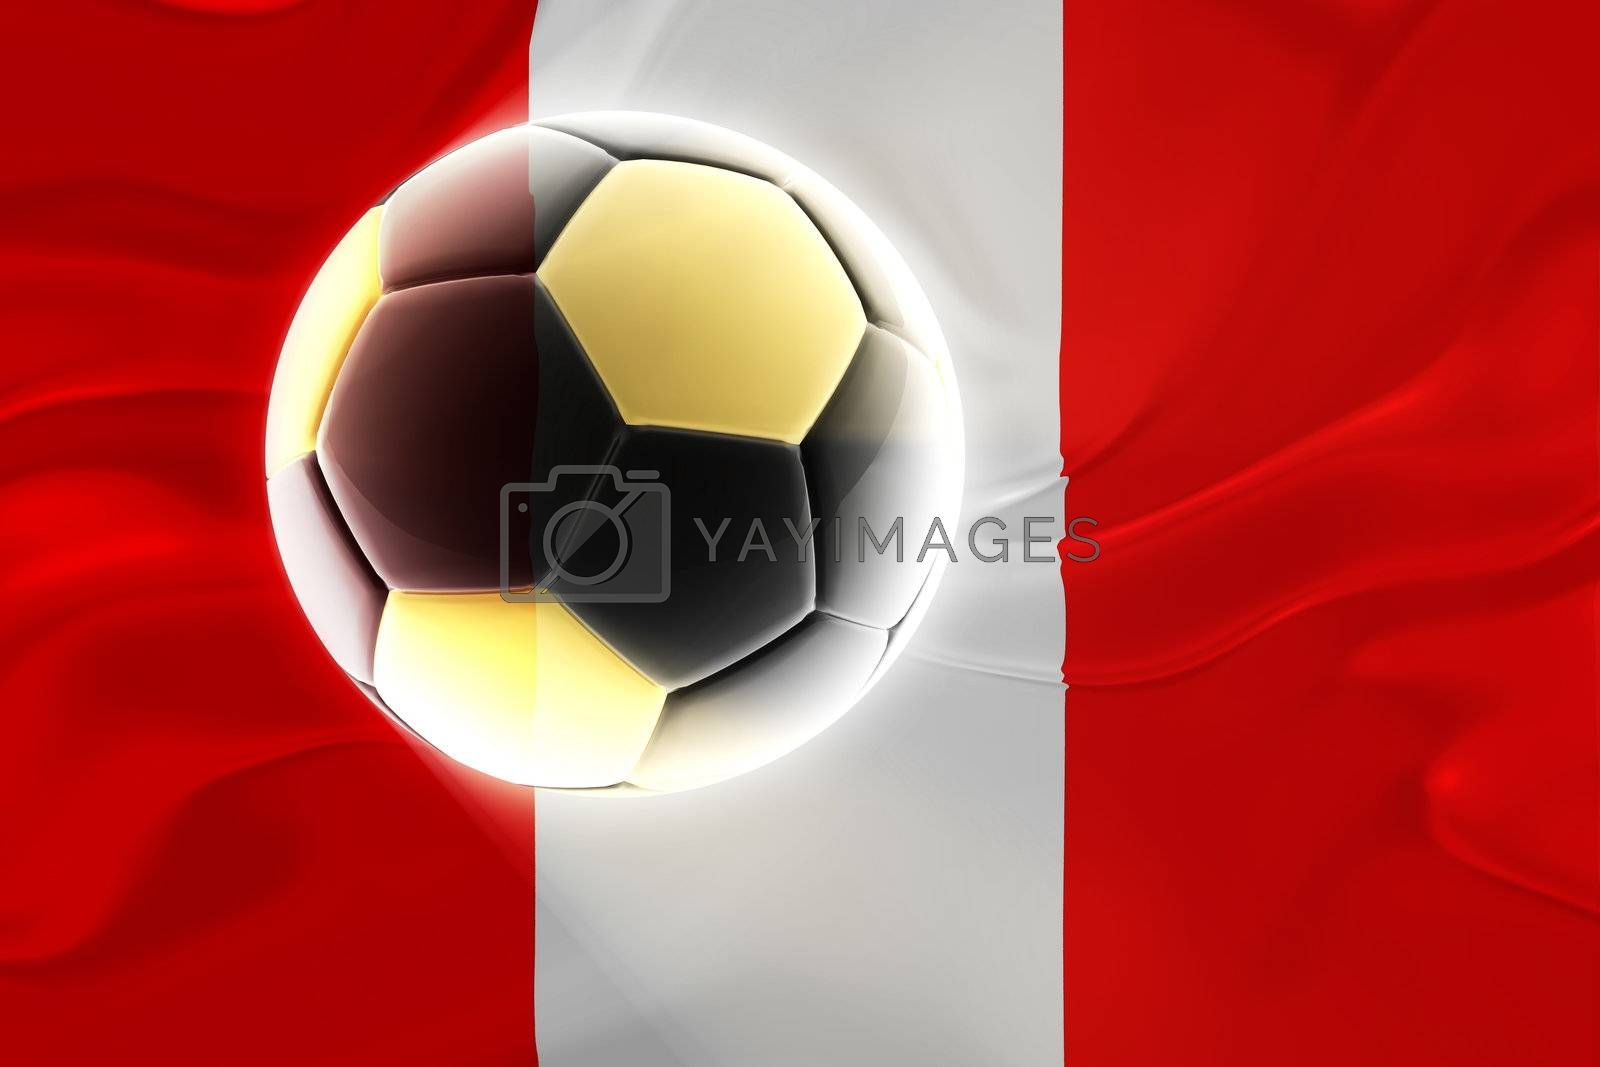 Flag of Peru, national country symbol illustration wavy fabric sports soccer football